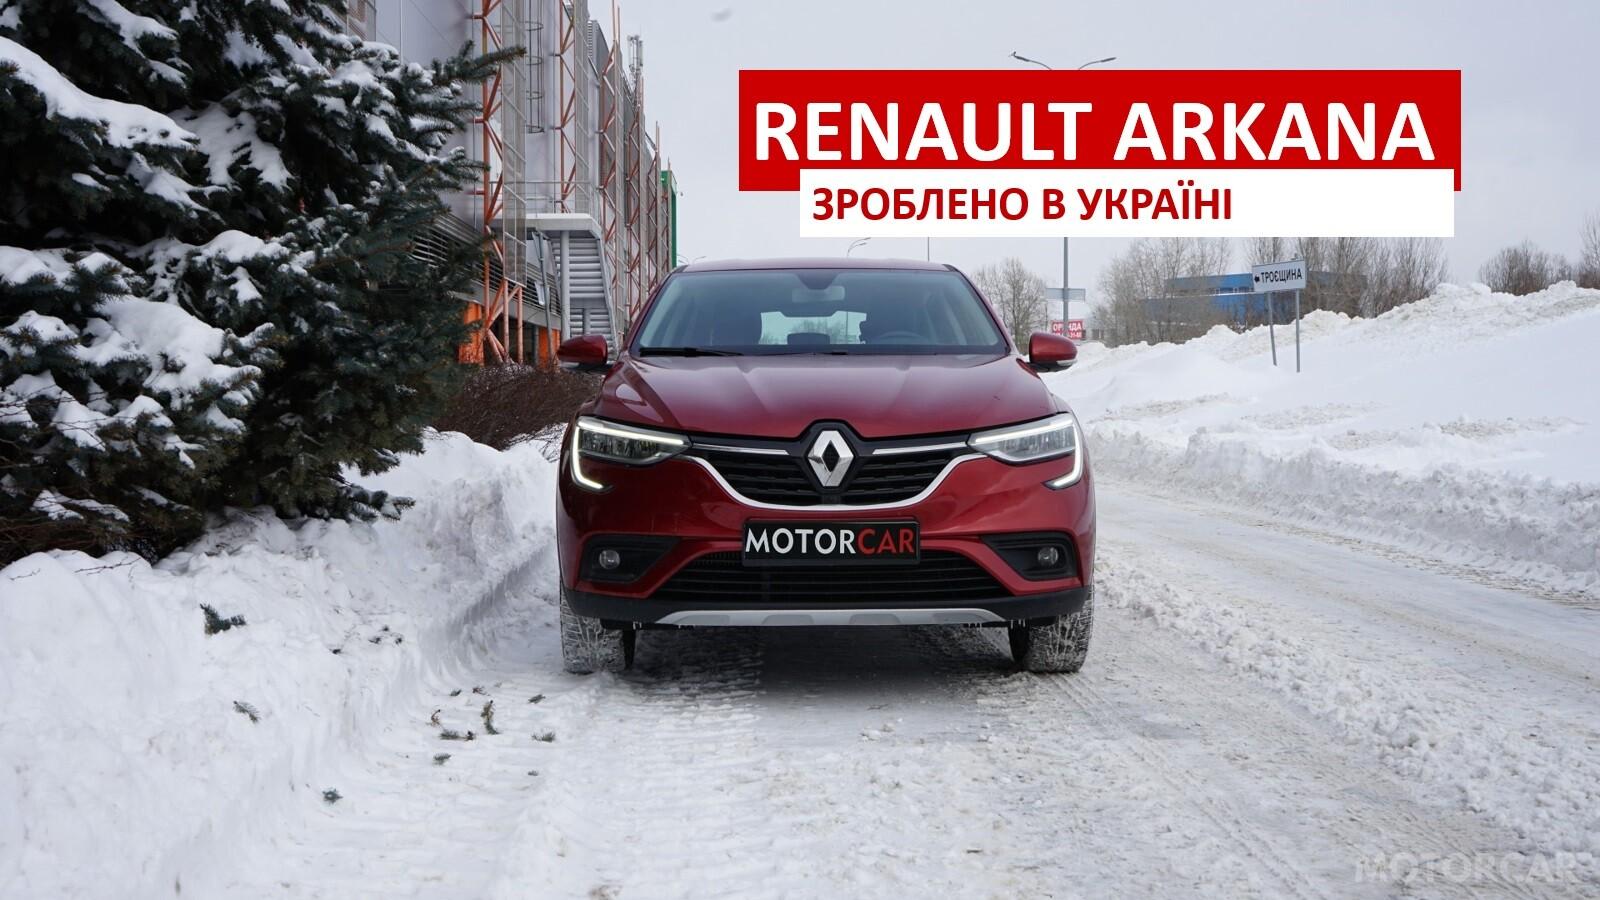 Renault Arkana 2021 року